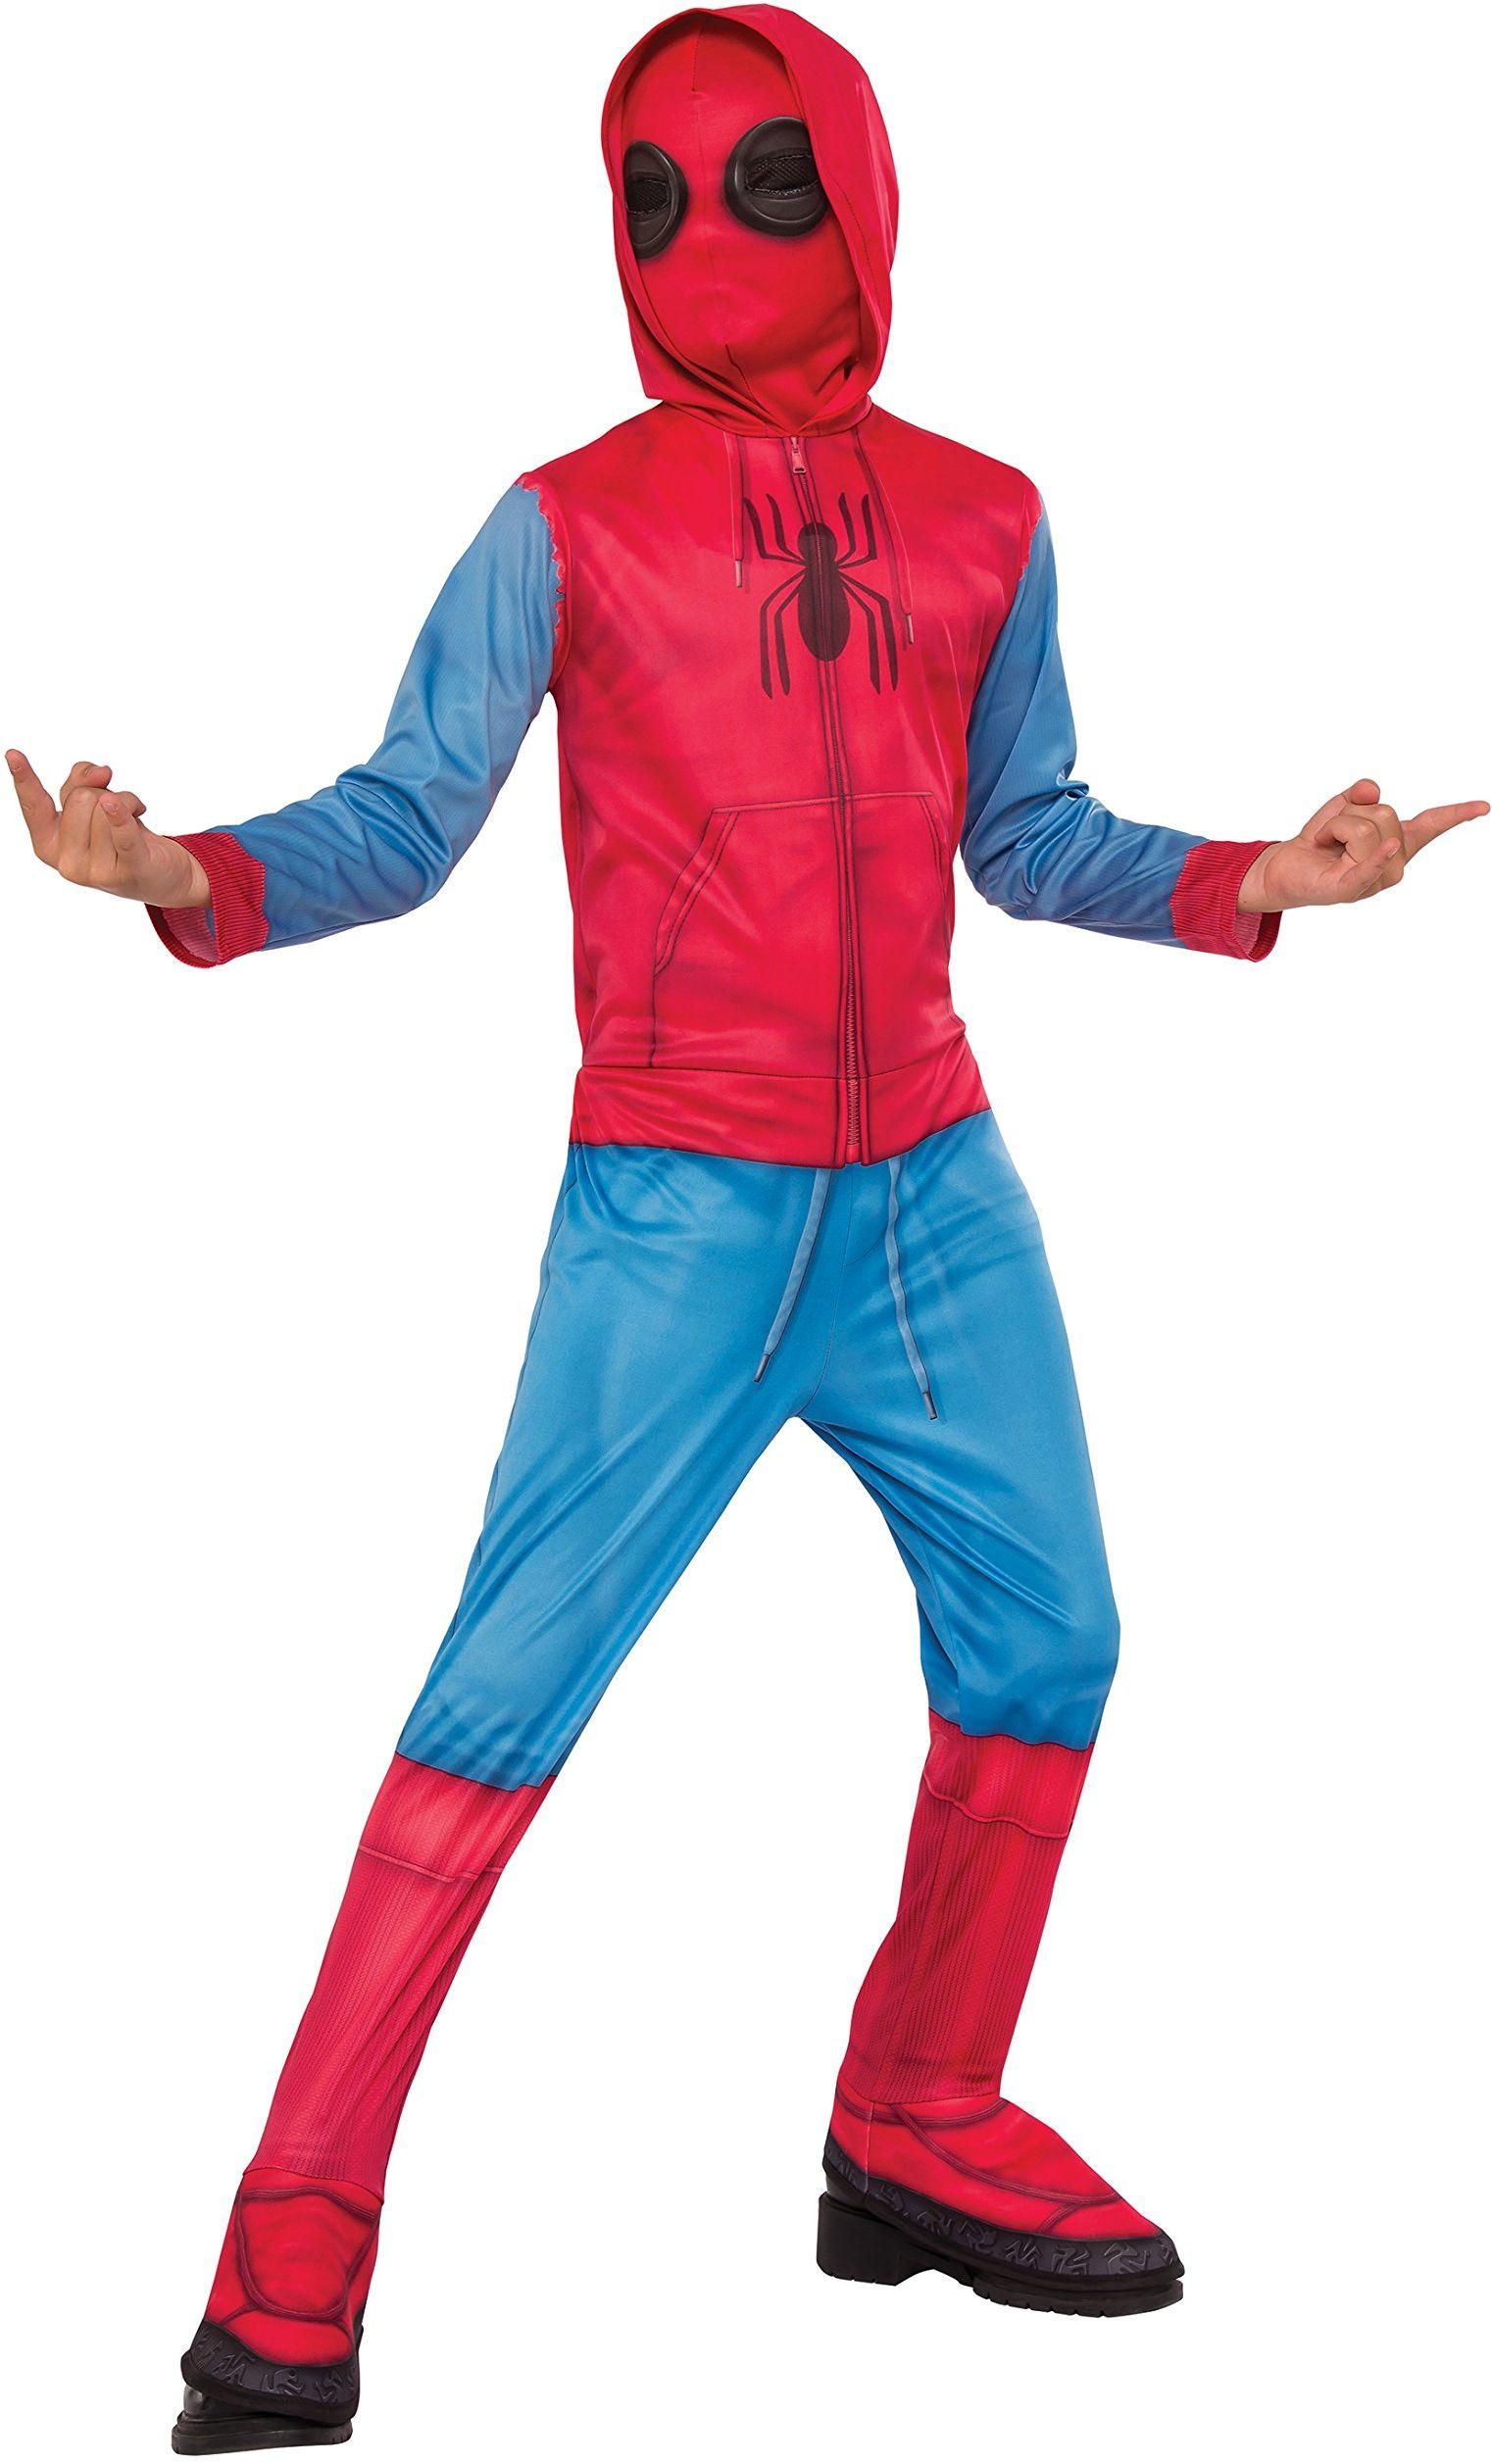 Marvel  i-640129 m  klasyczny design  Sweat  Spider-Man Homecoming z couvre-bottes + kominiarka, rozmiar M